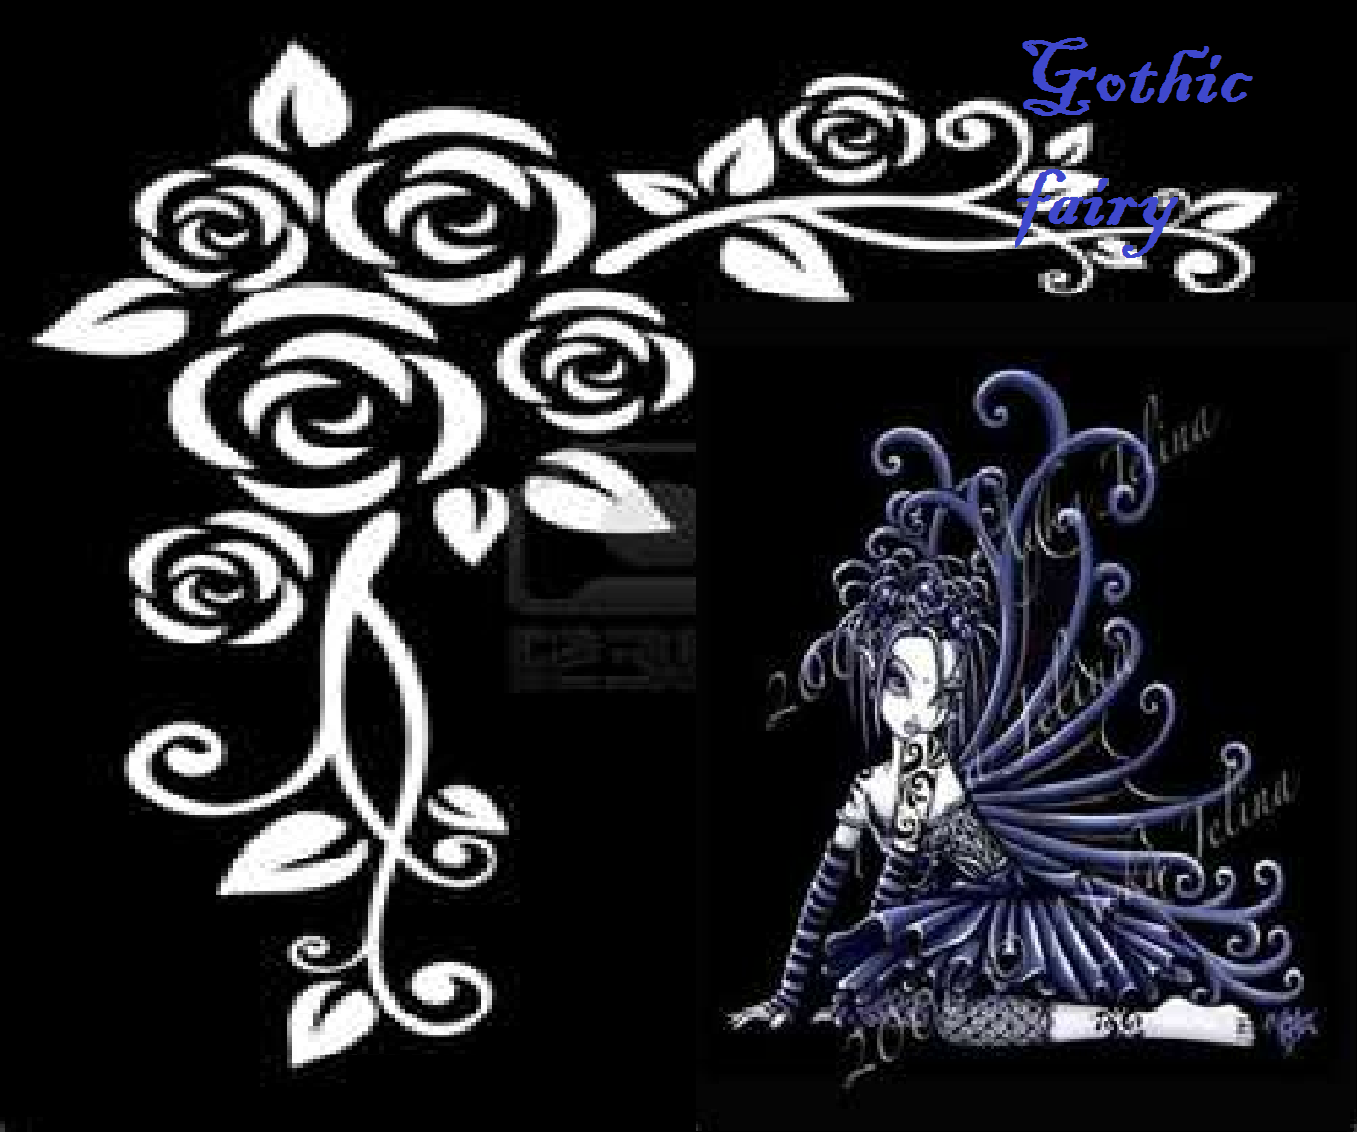 Готика fairy